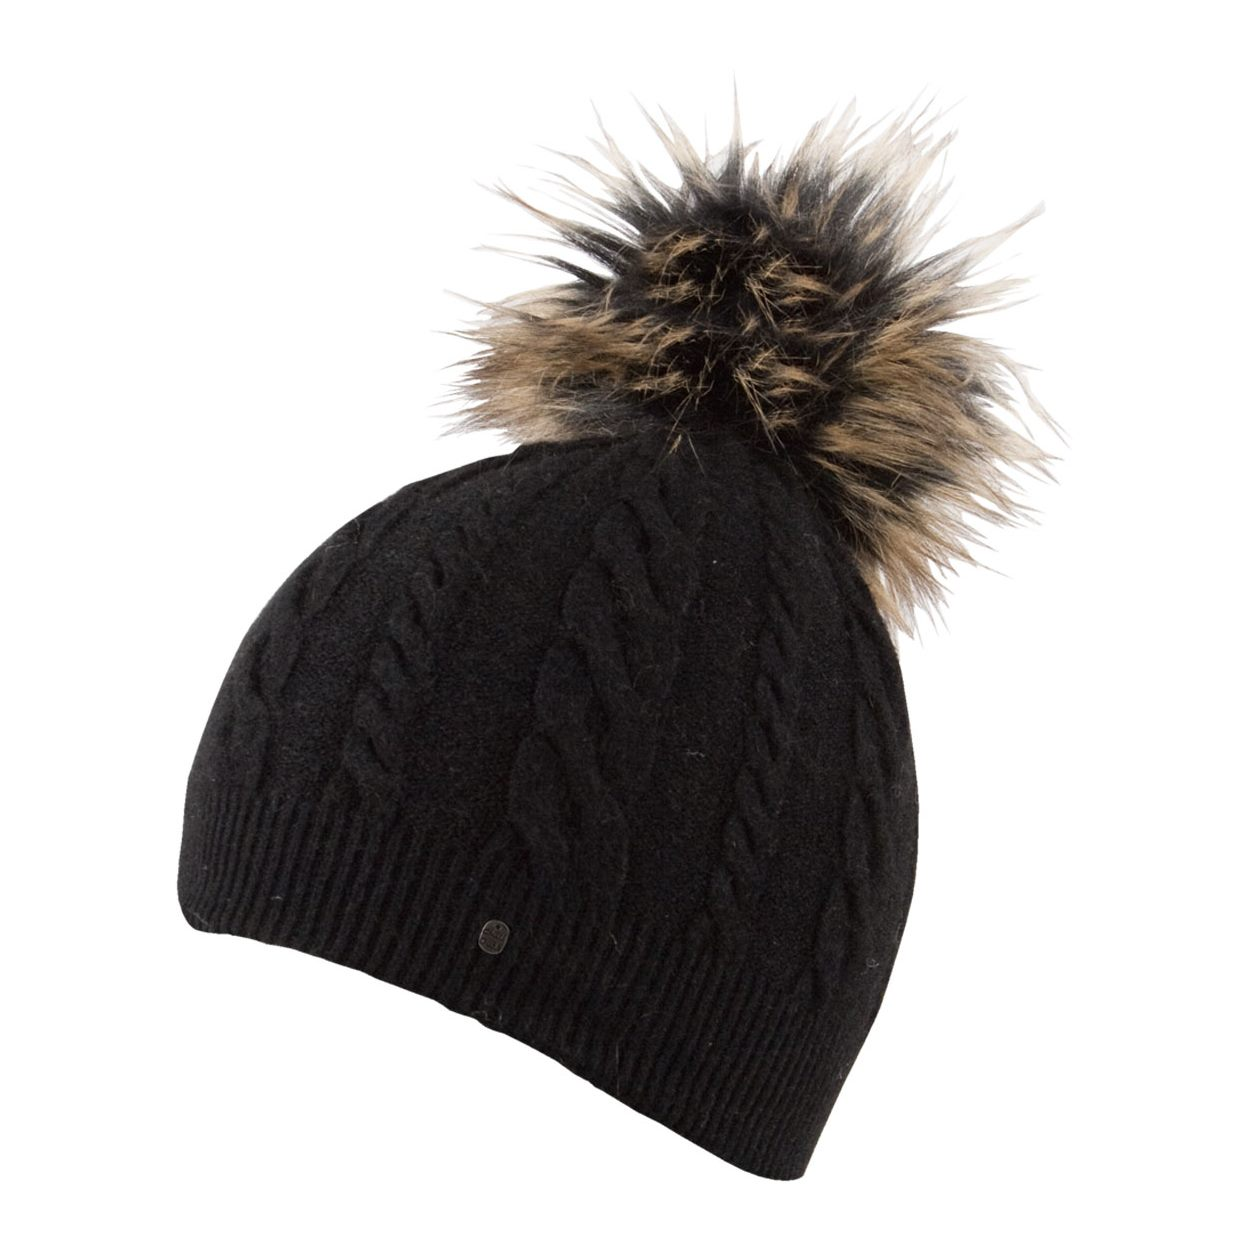 Black Vanessa Fake Fur Bobble Hat - Chillouts Fur Hats 2c1a088b600